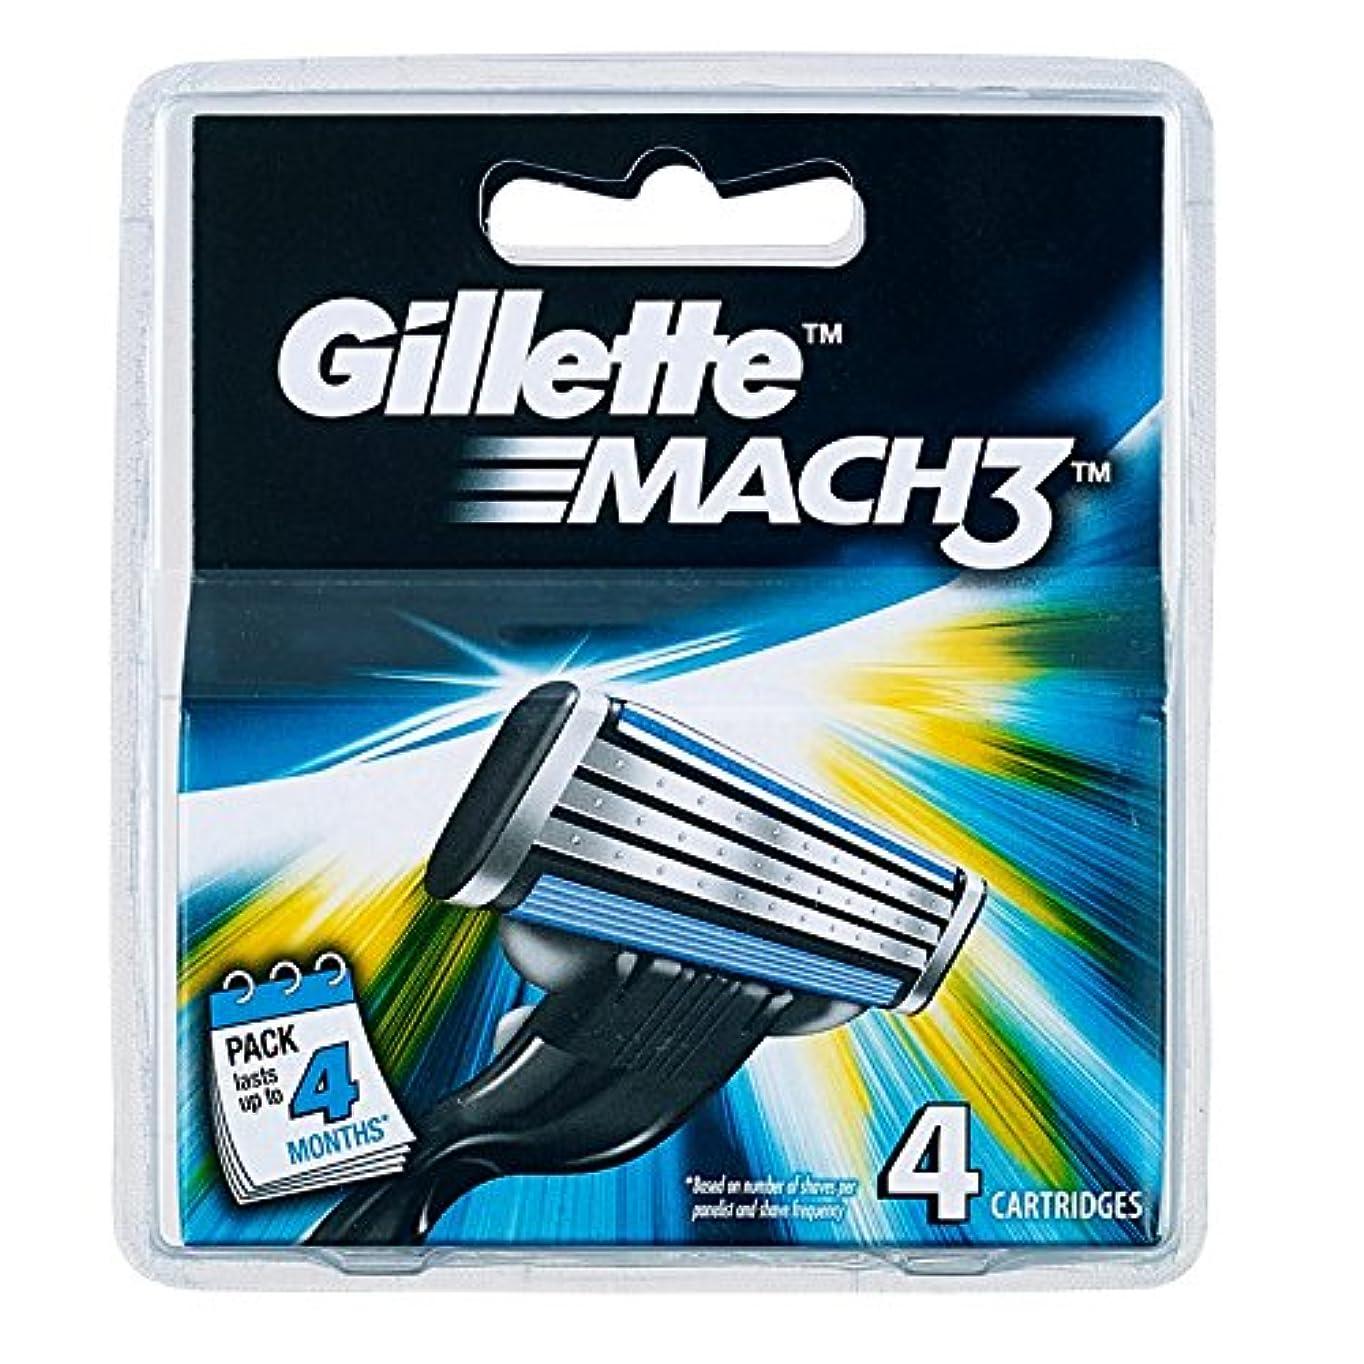 治療憂鬱前投薬Gillette MACH3 SHAVING RAZOR CARTRIDGES BLADES 4 Pack [並行輸入品]